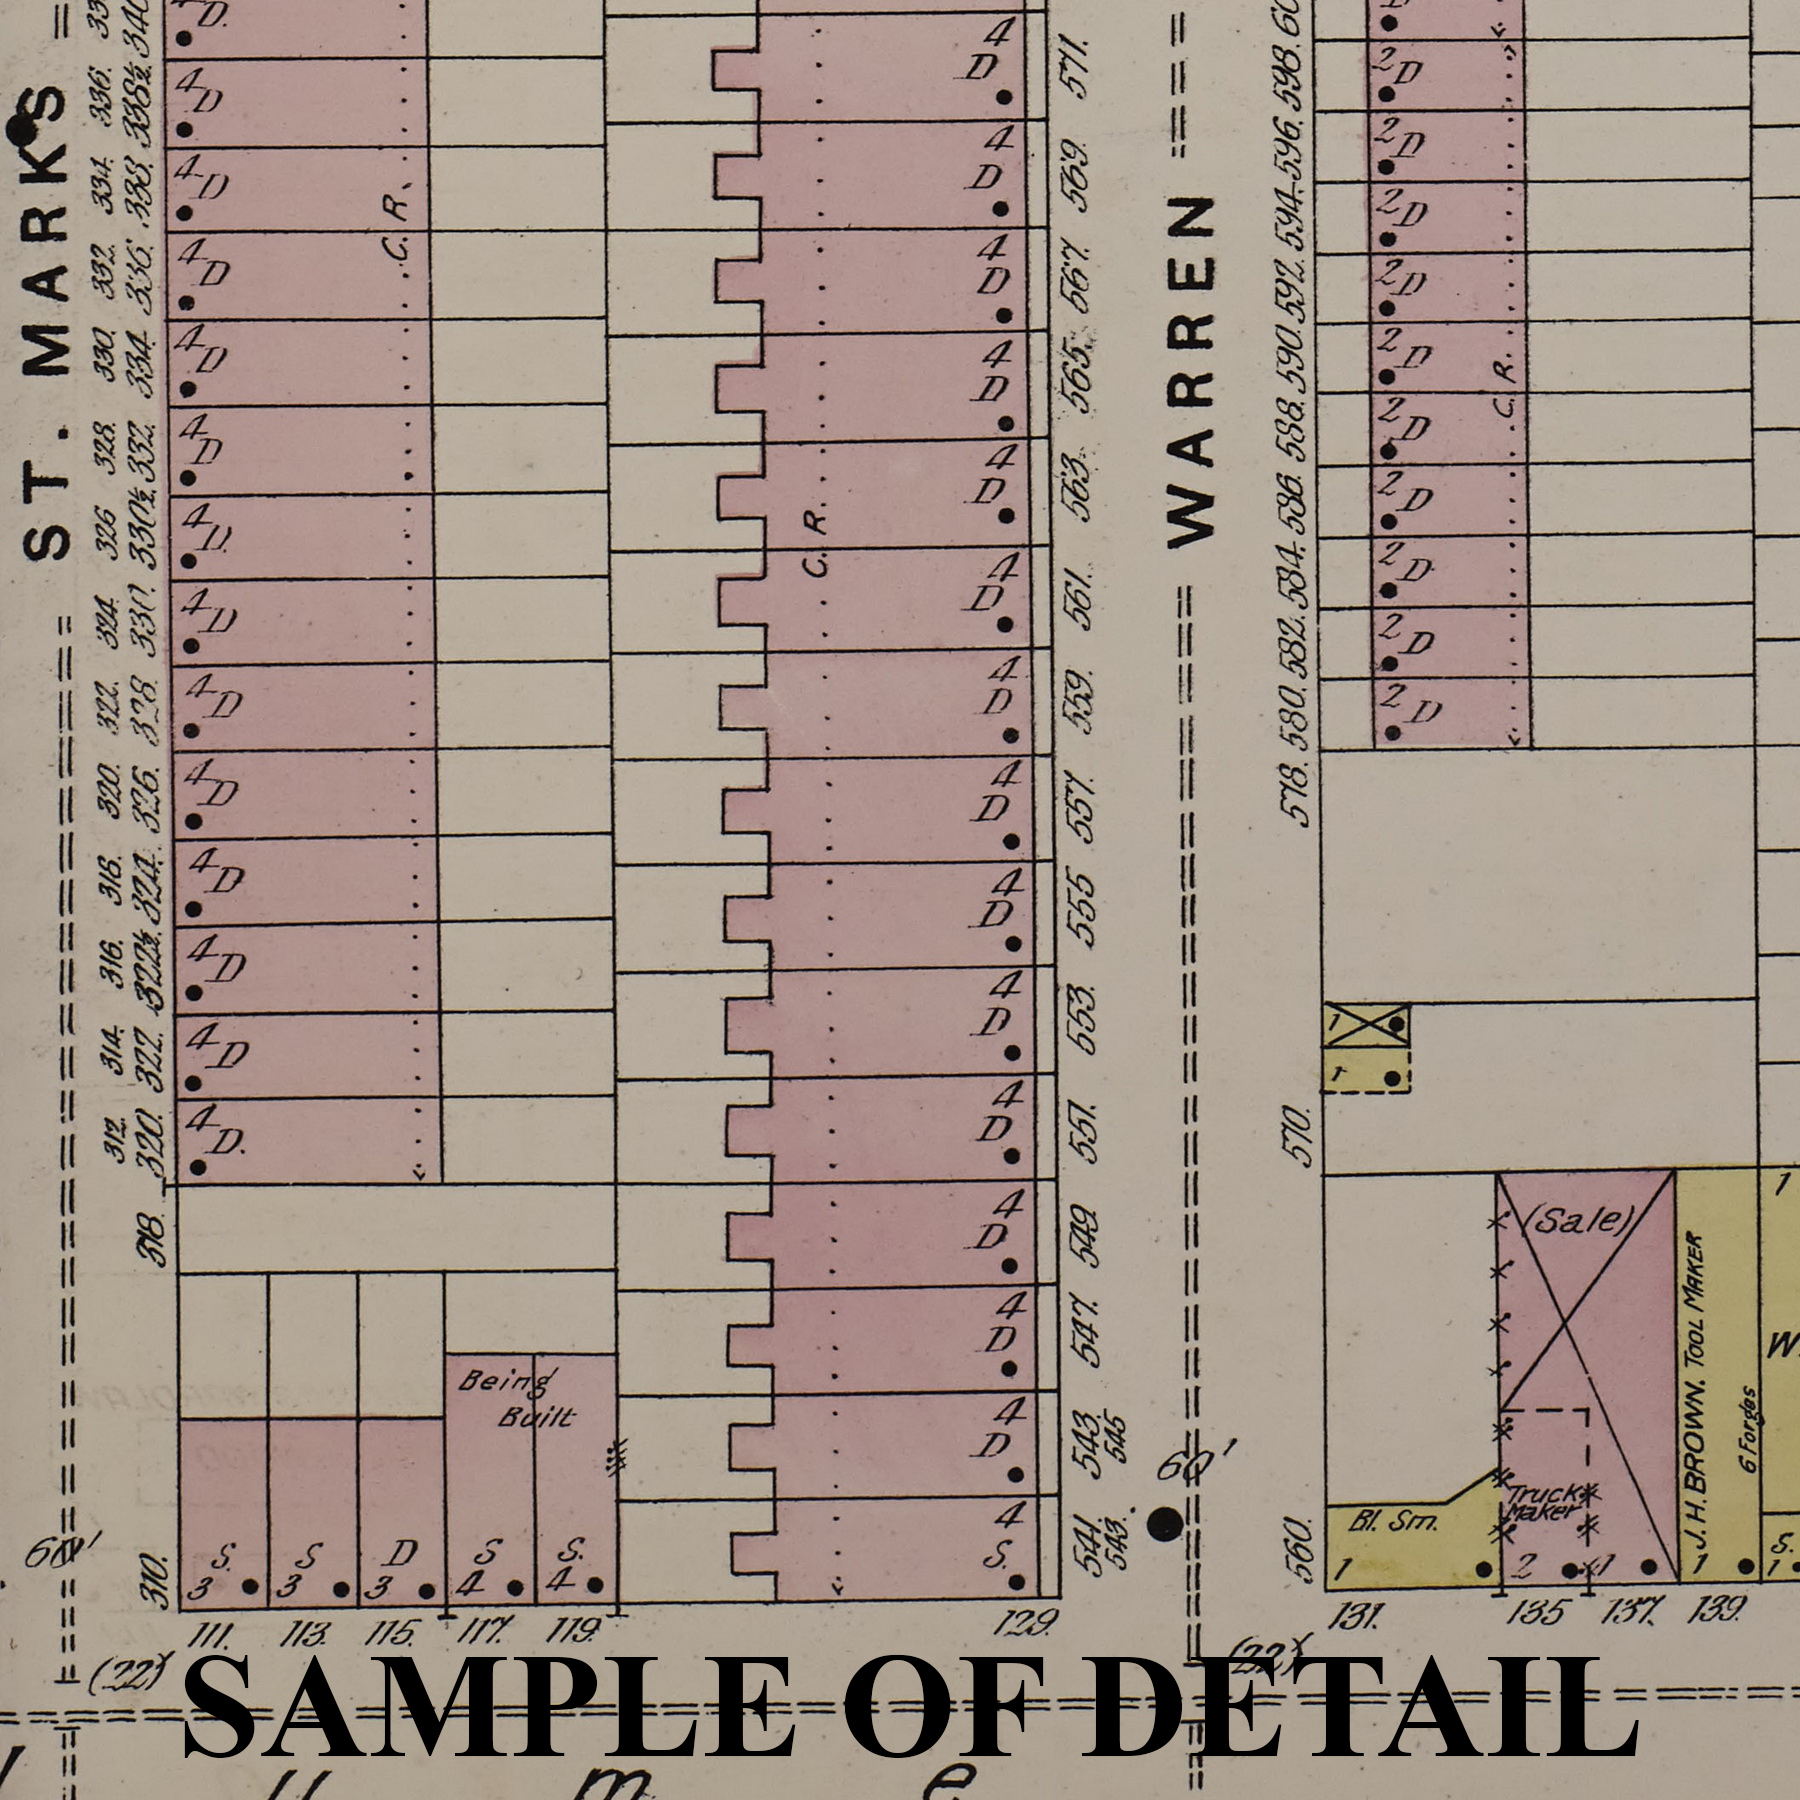 sample-05791-06-1888-0136r.jpg